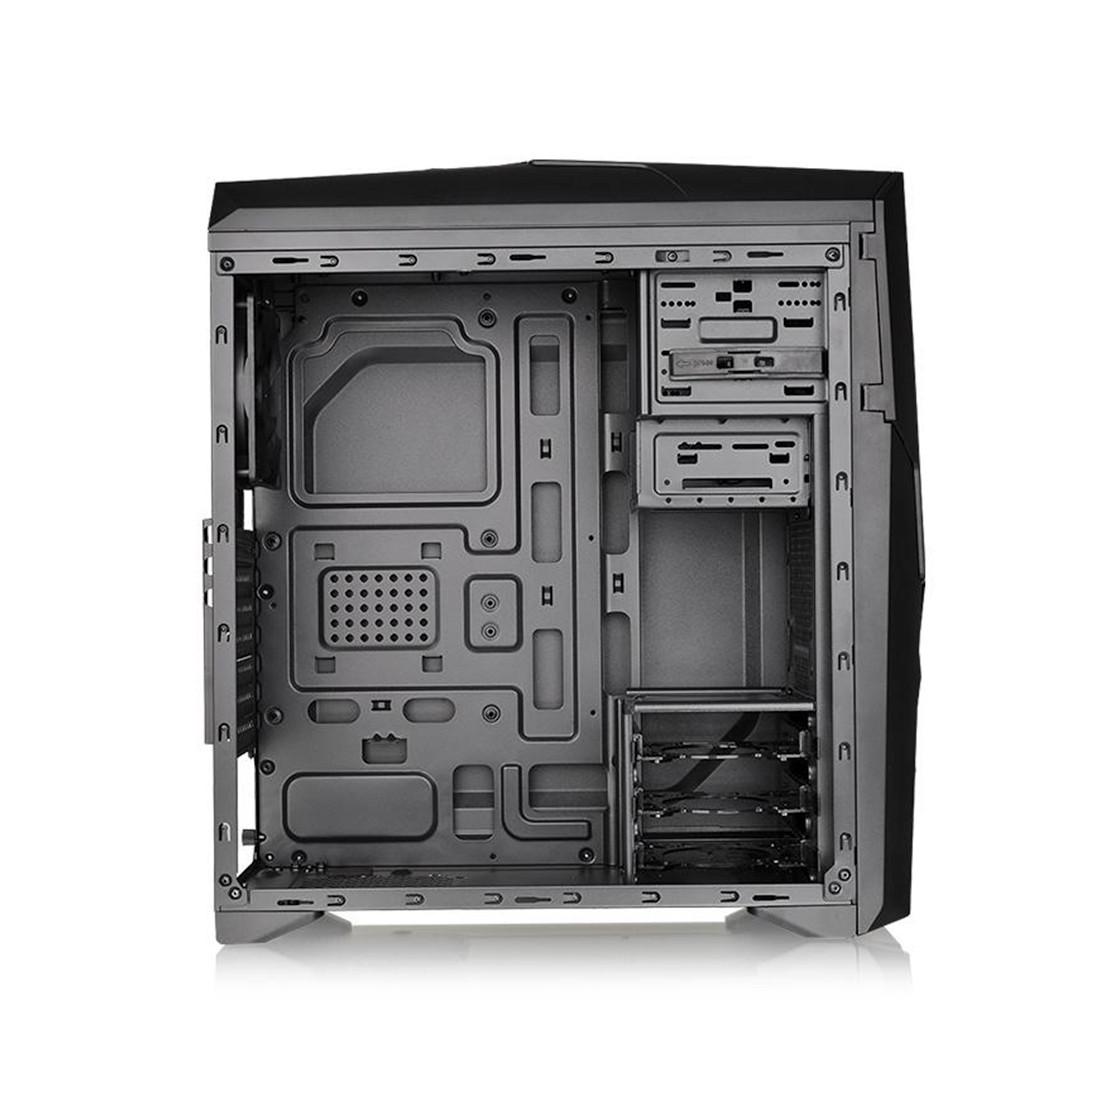 Компьютерный корпус Thermaltake Versa N25 без Б/П